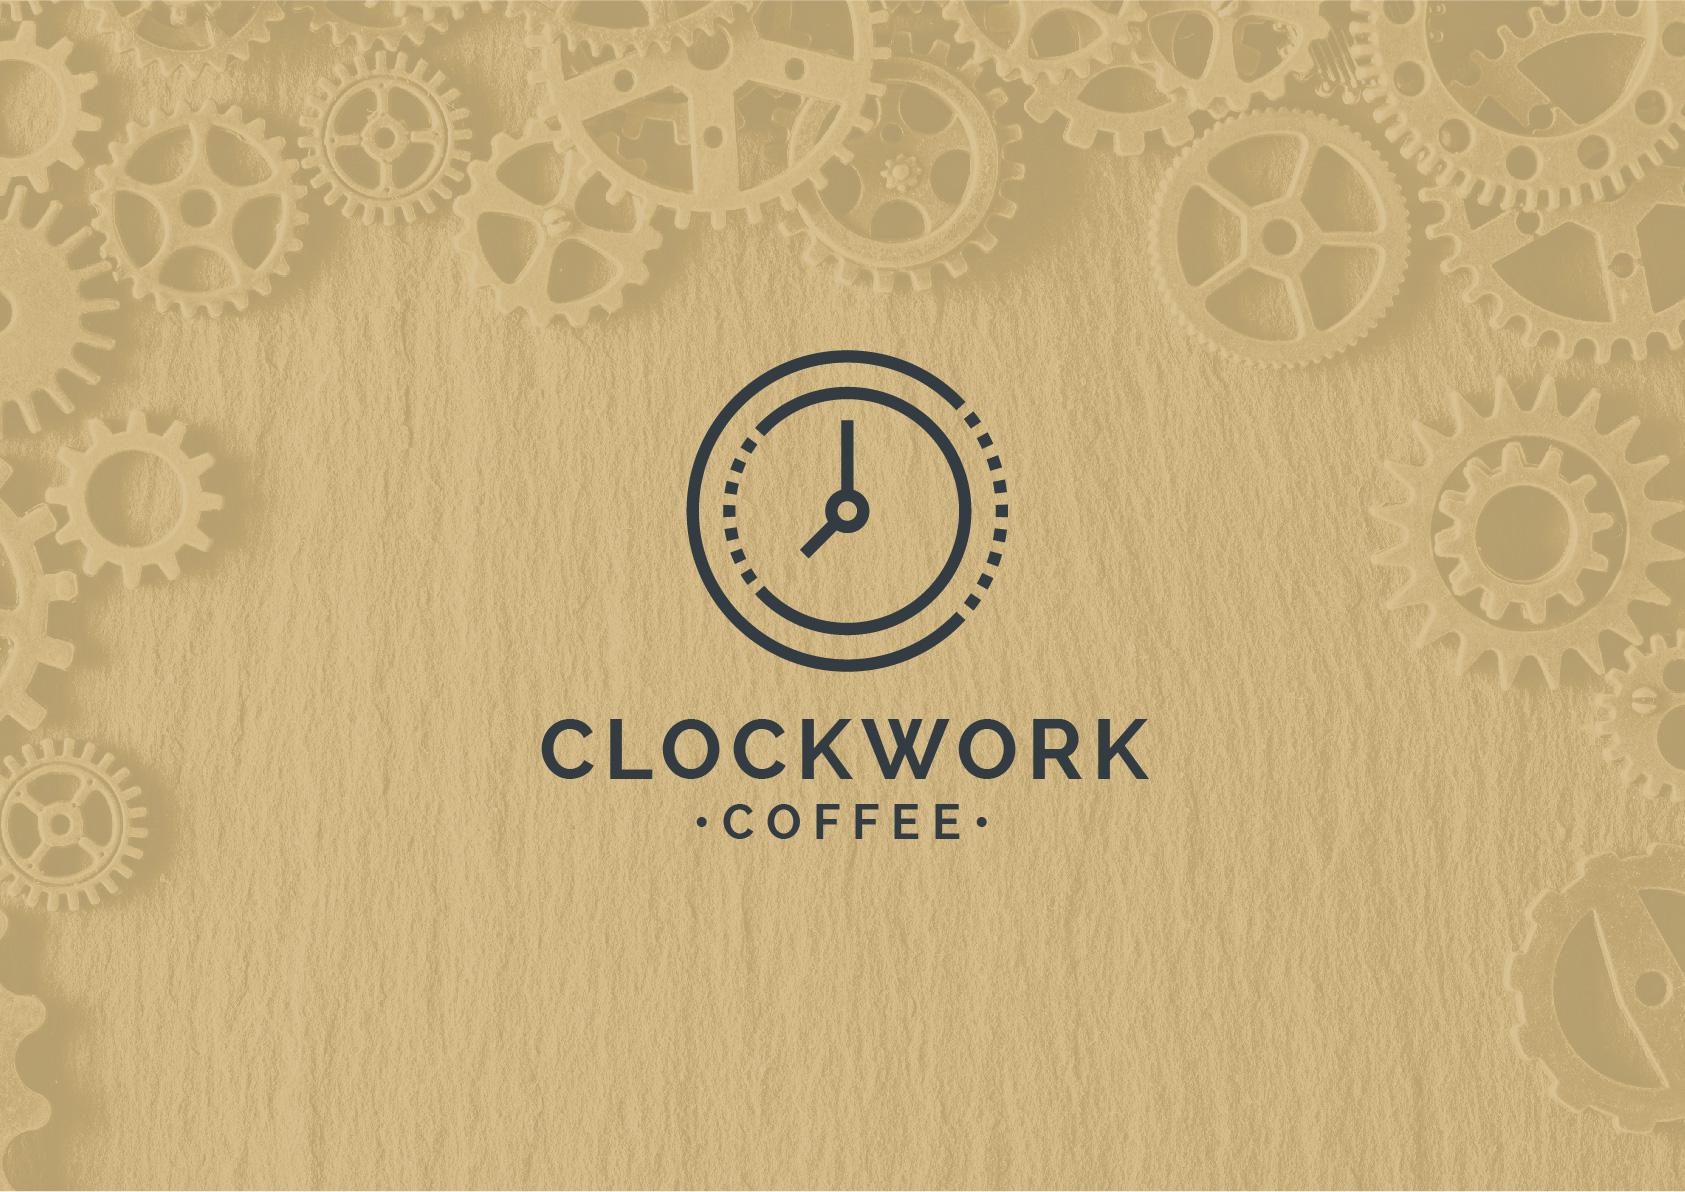 Clockwork Coffee  7.jpg